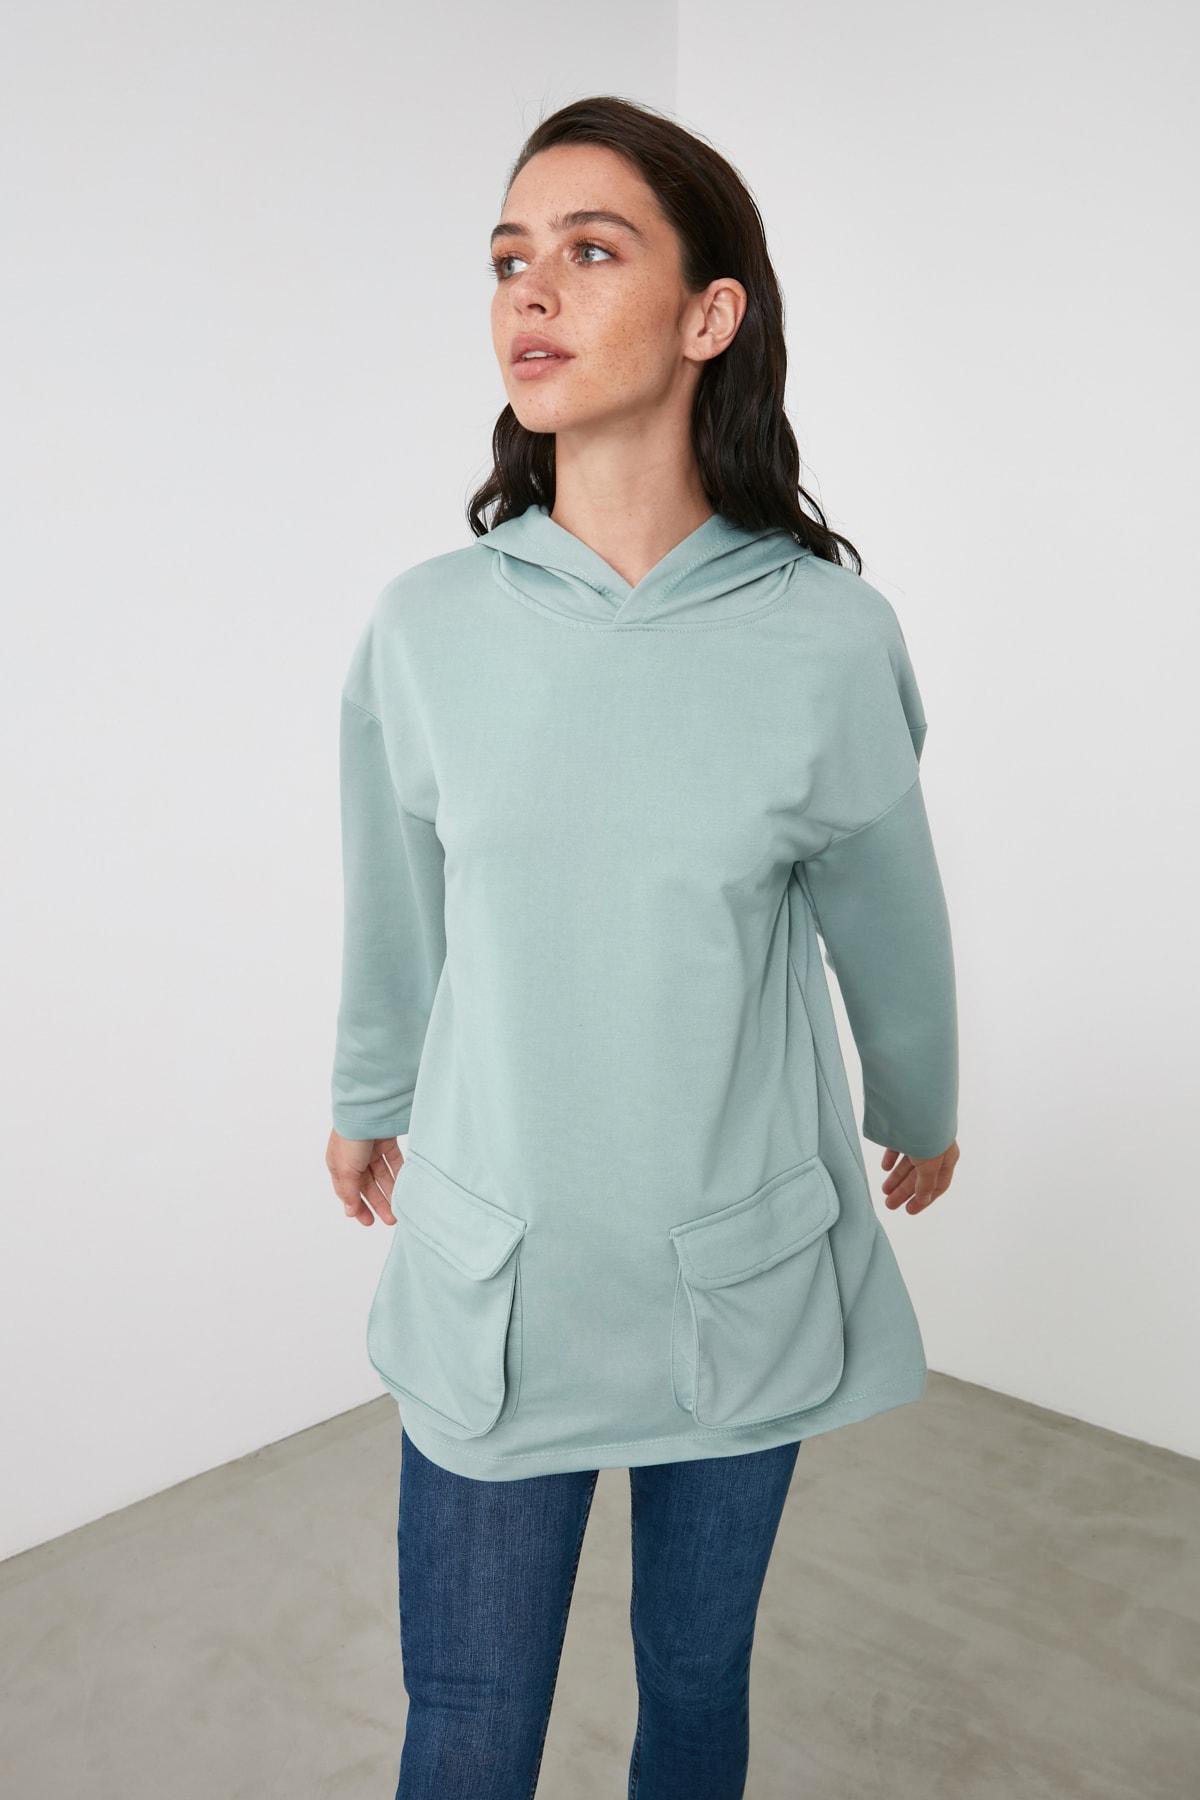 TRENDYOLMİLLA Mint Cep Detaylı Kapüşonlu Örme Sweatshirt TWOAW21SW1318 2